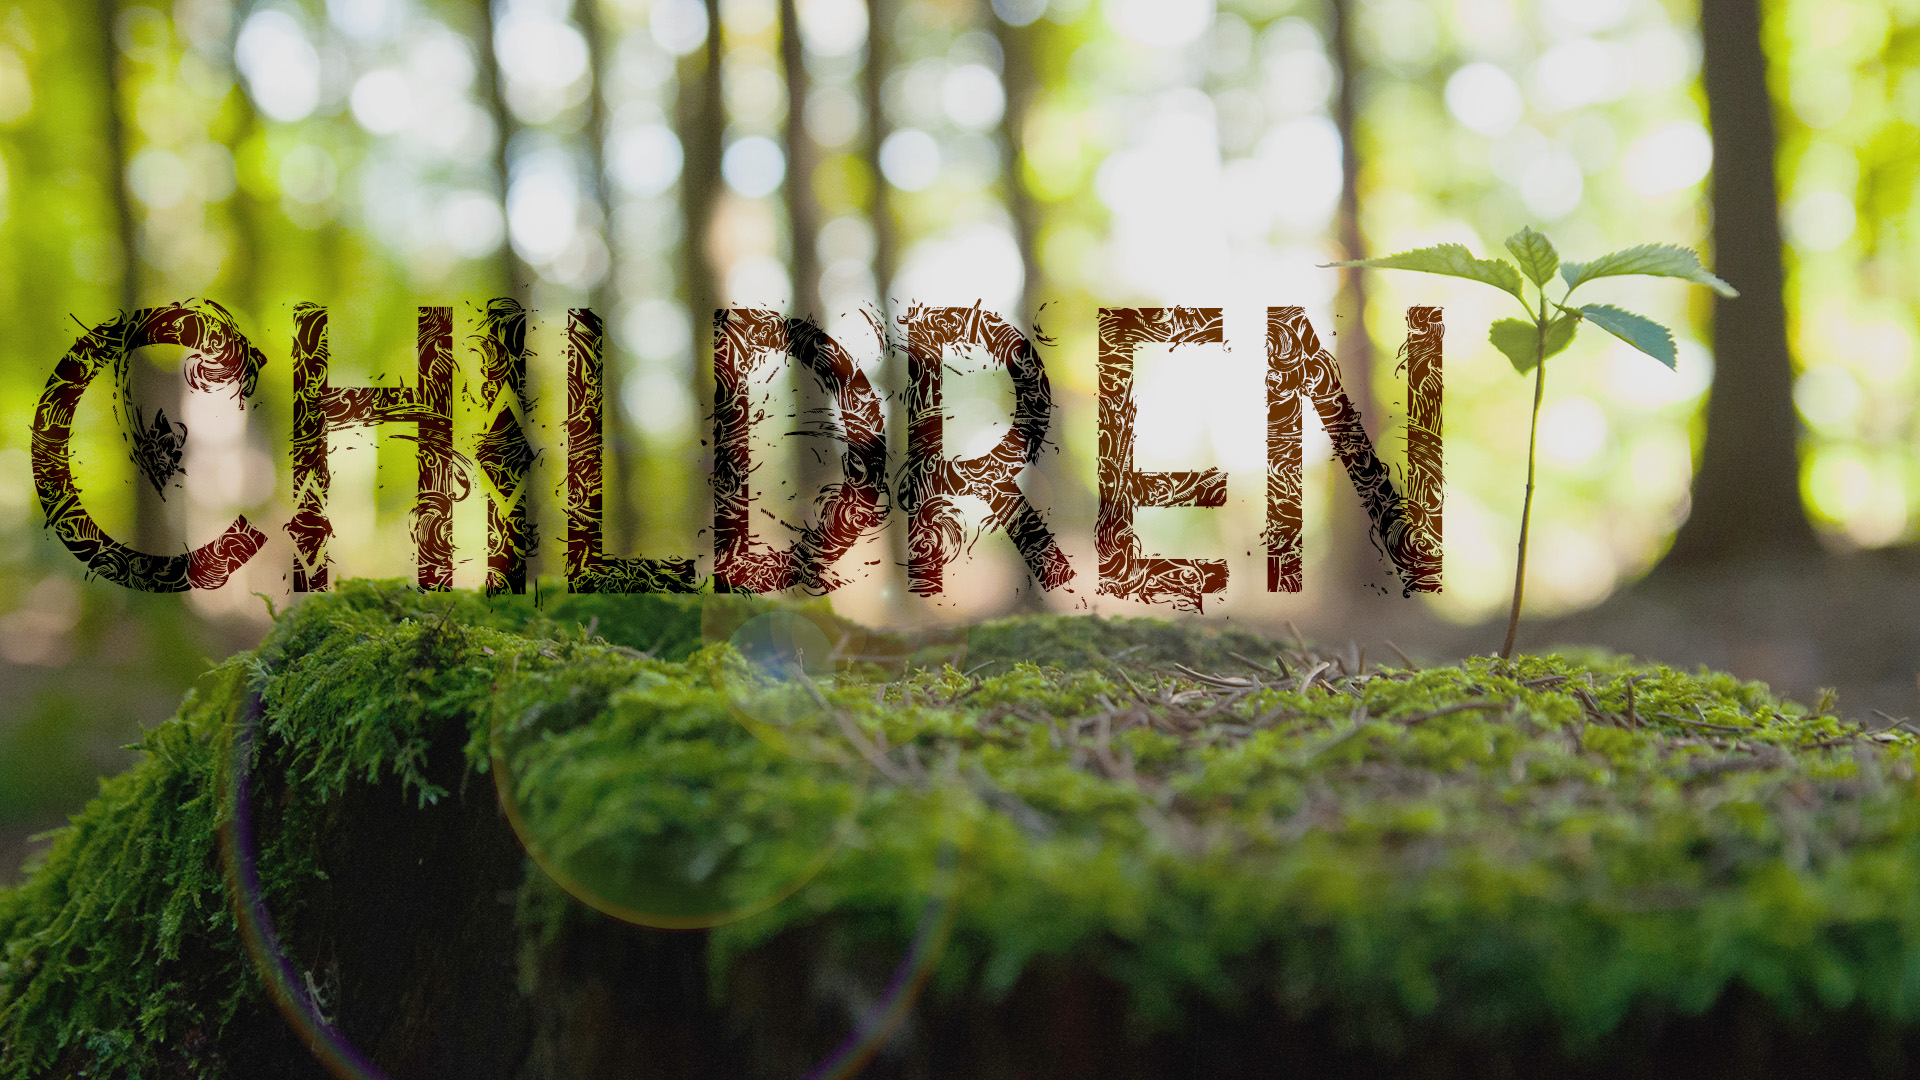 ChildrensMinistry@CoreChurchLA.com